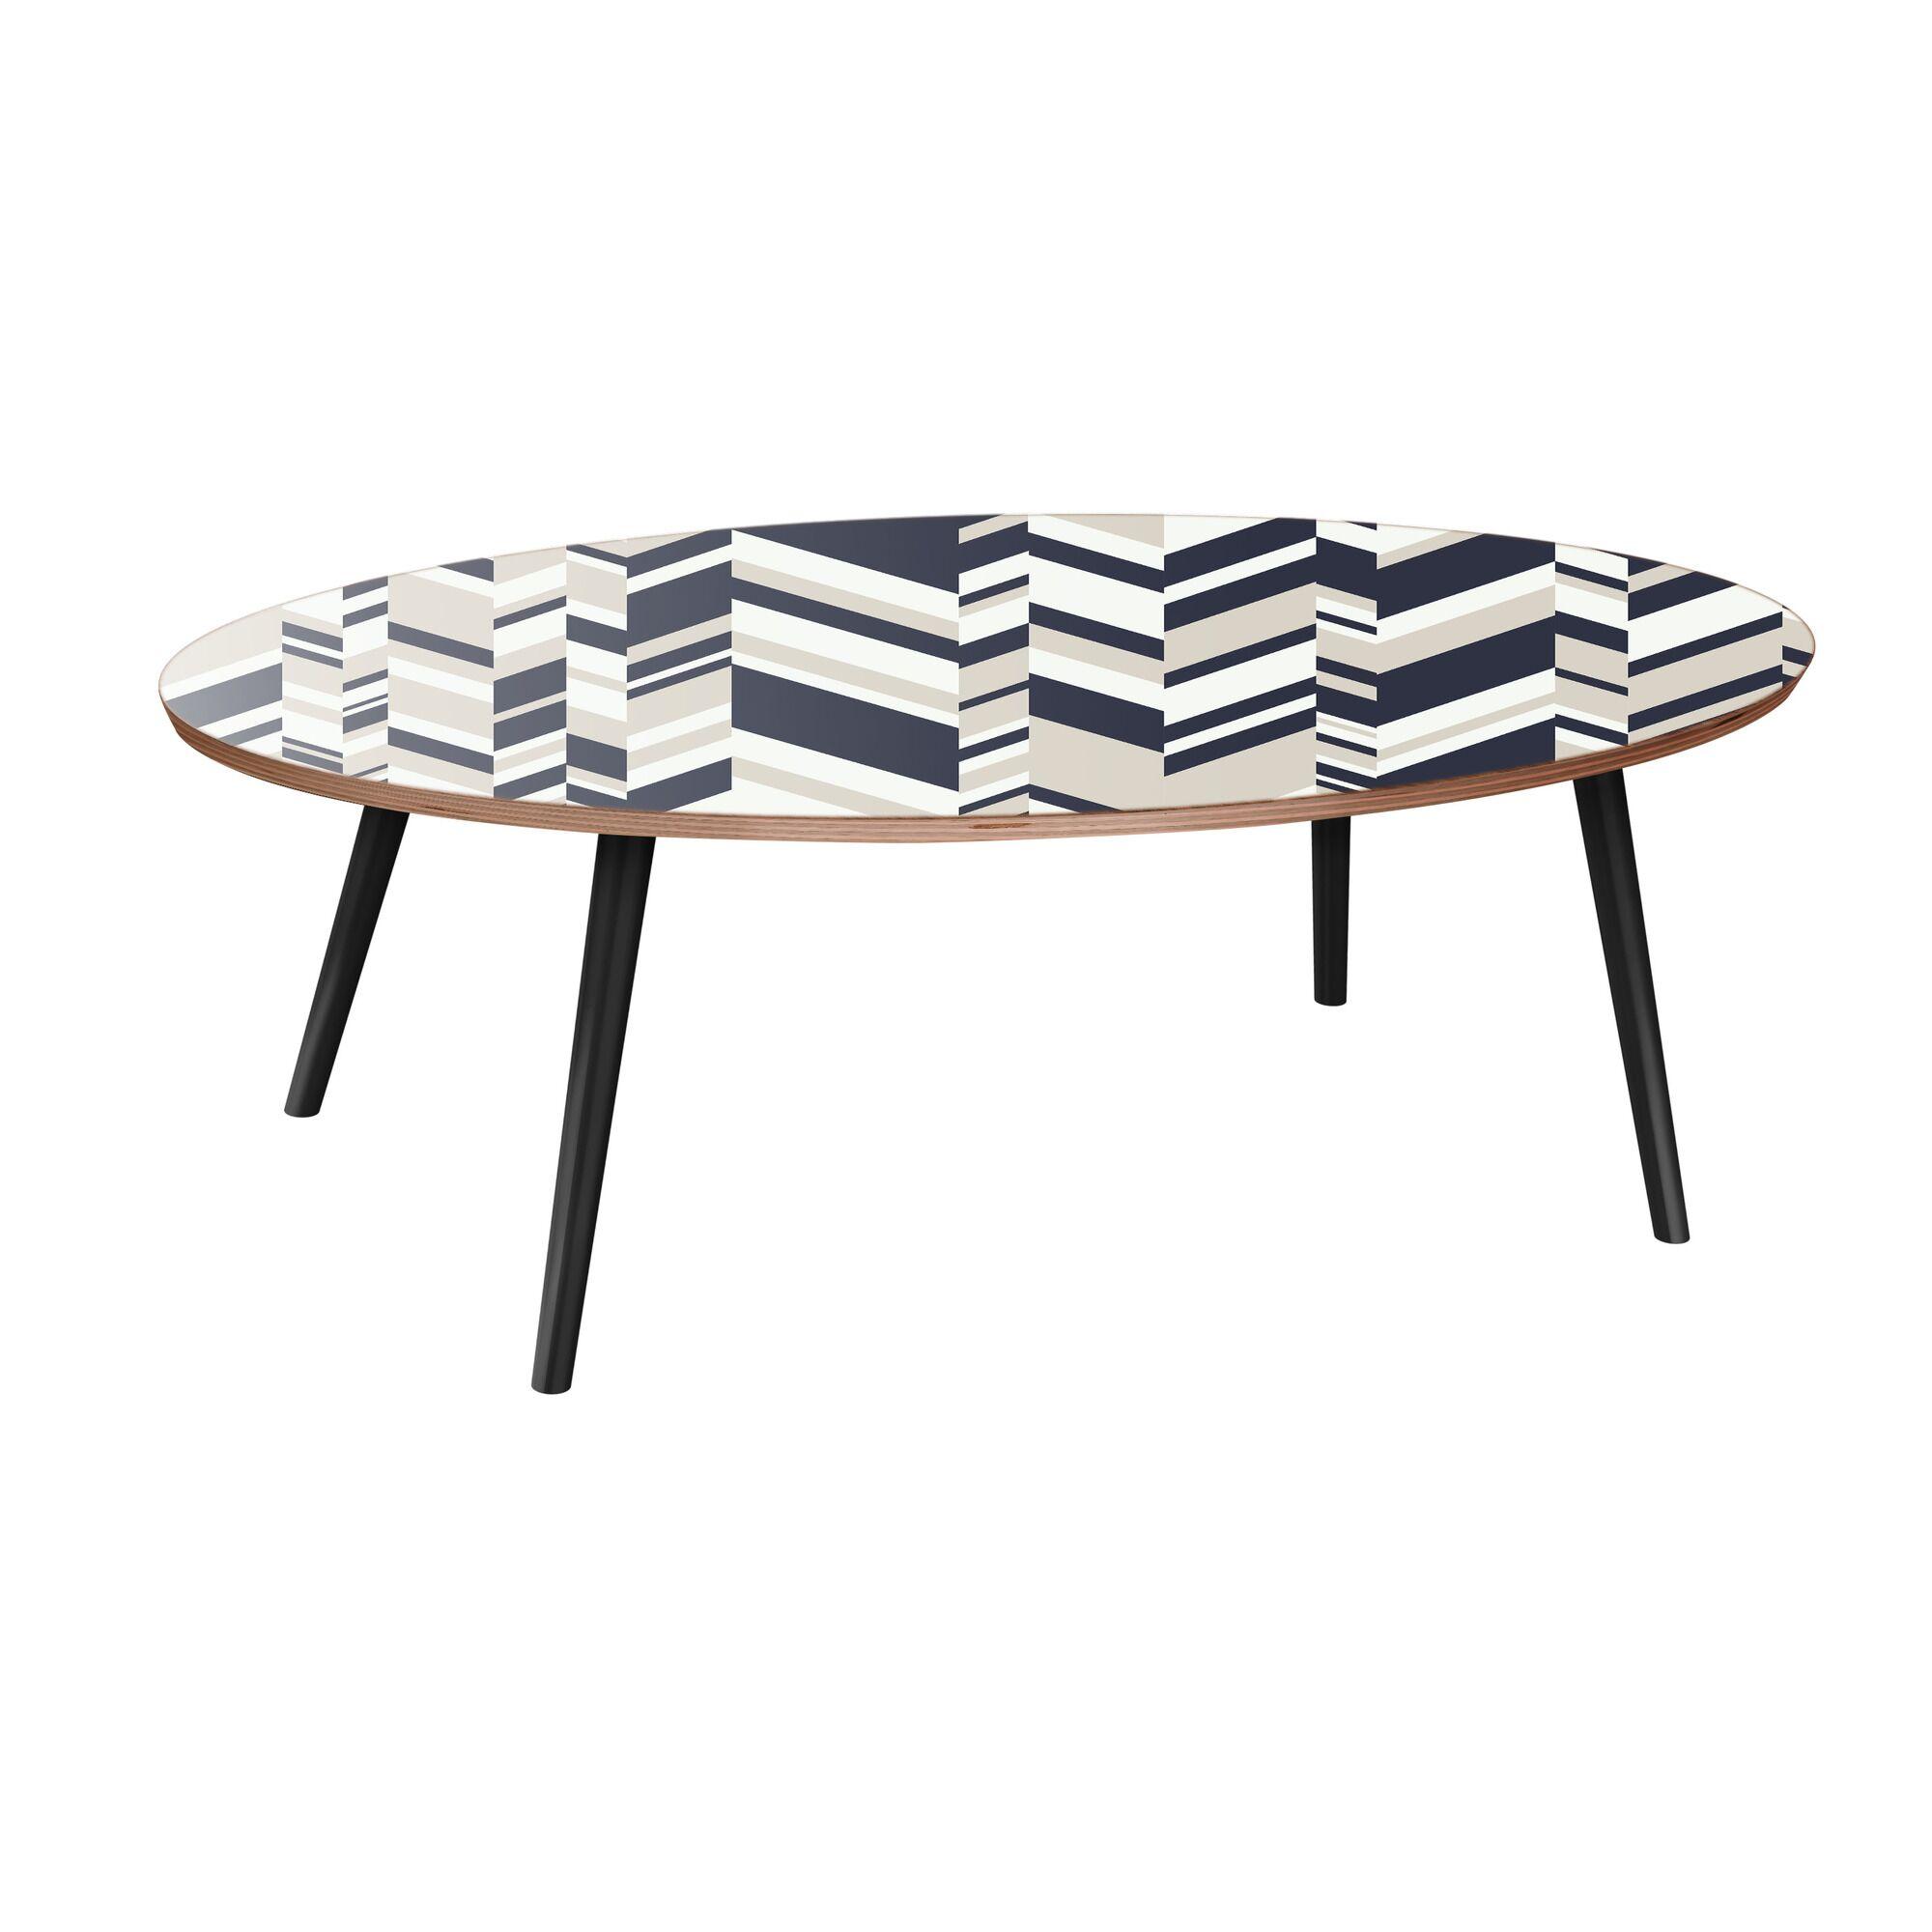 Galiano Coffee Table Table Top Color: Walnut, Table Base Color: Black